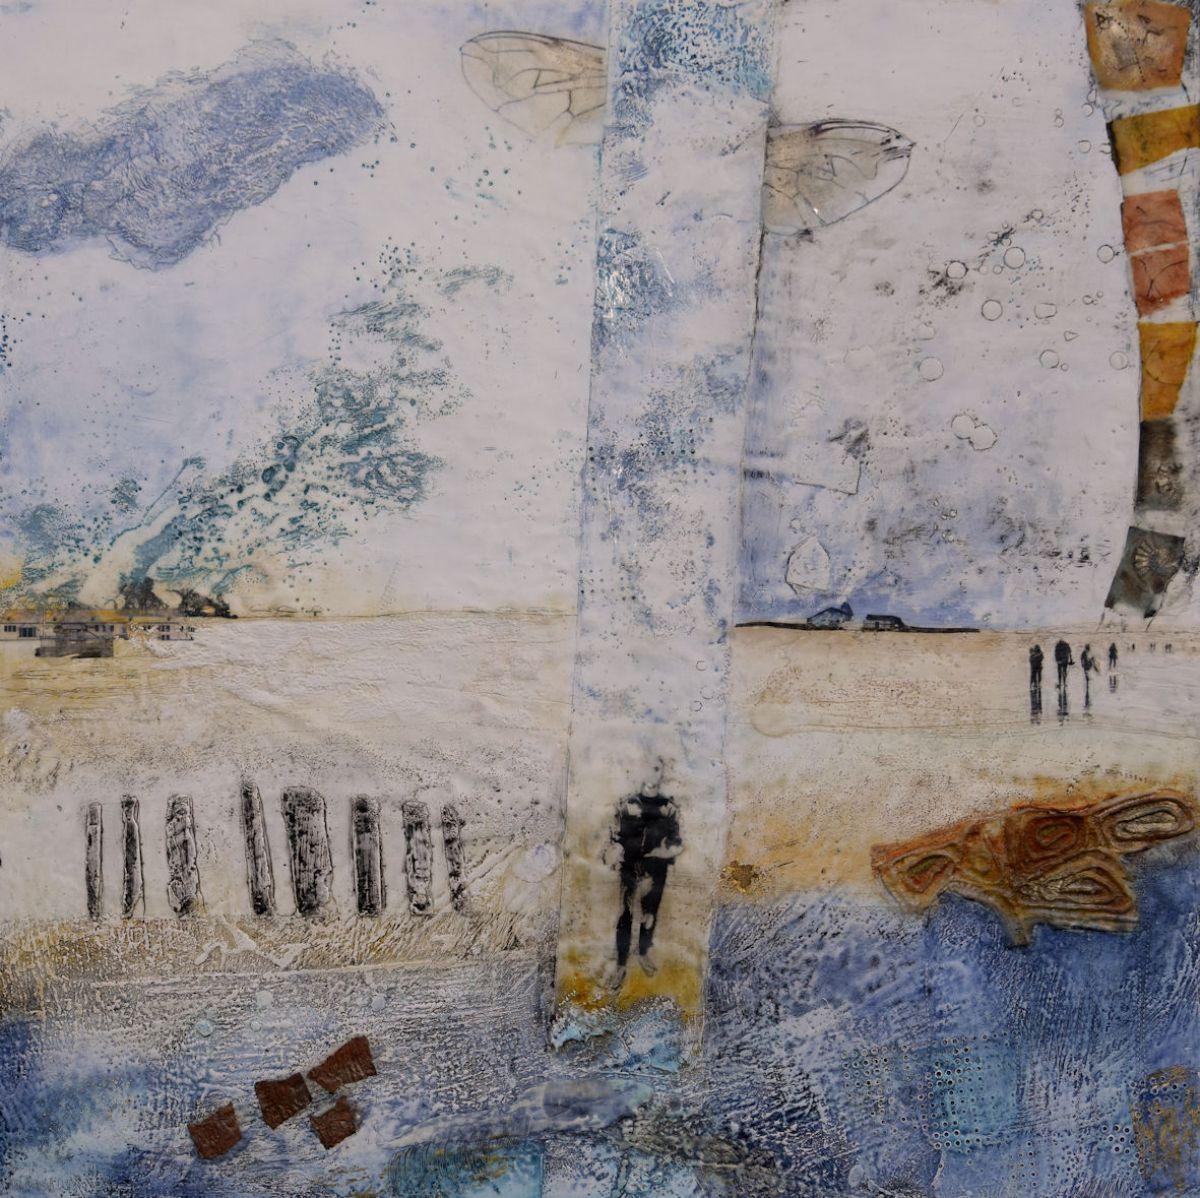 Kunst: Always a story 1 van kunstenaar Trijnie Mohlmann